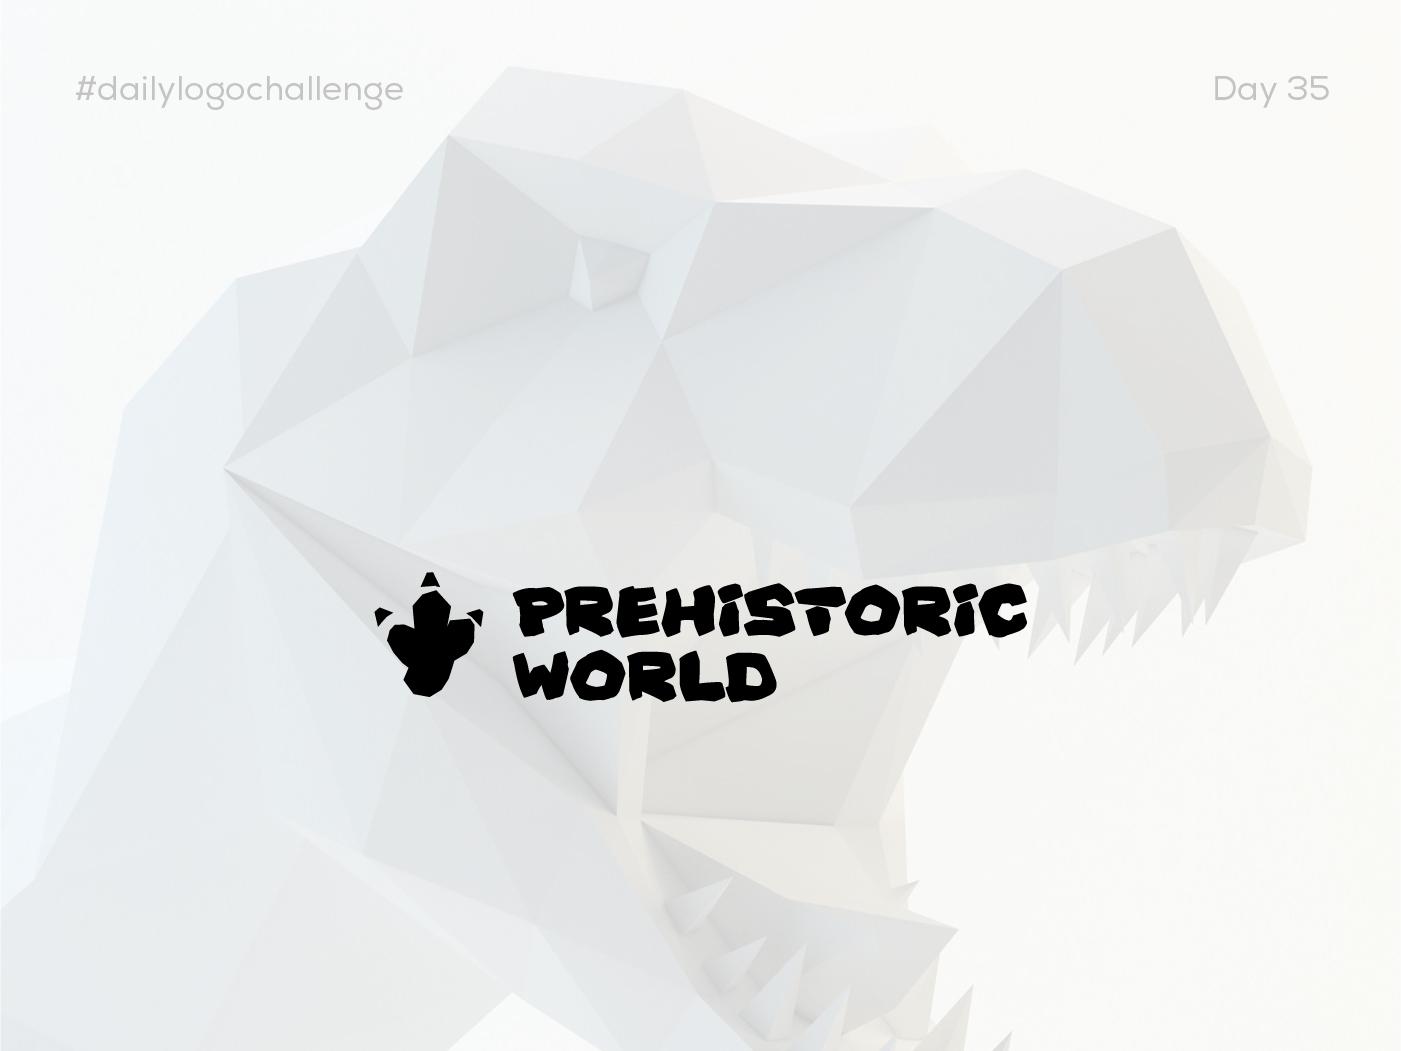 Dailychallenge Insta Shots Pt4 05 carnivore trex dinosaur dailylogochallenge branding logo vector typography design mirasadesign mirasa